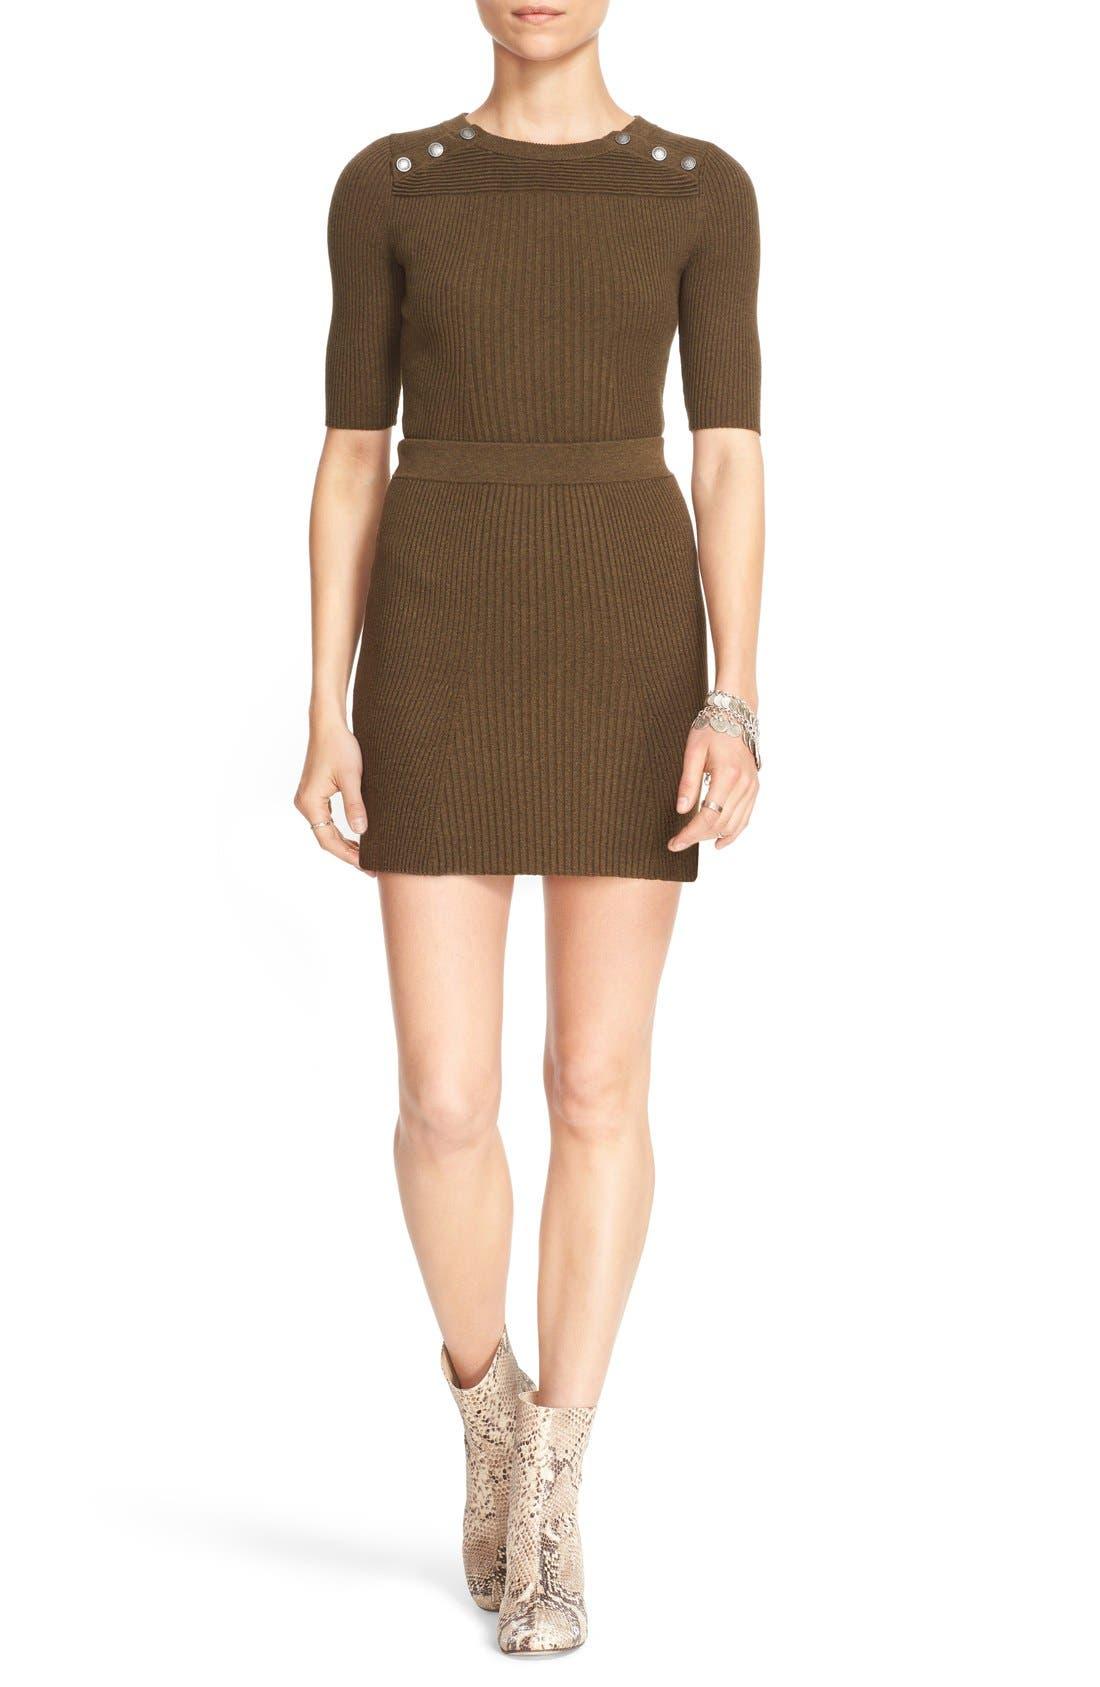 Alternate Image 1 Selected - Free People 'Little Minx' Cotton Sweater & Miniskirt